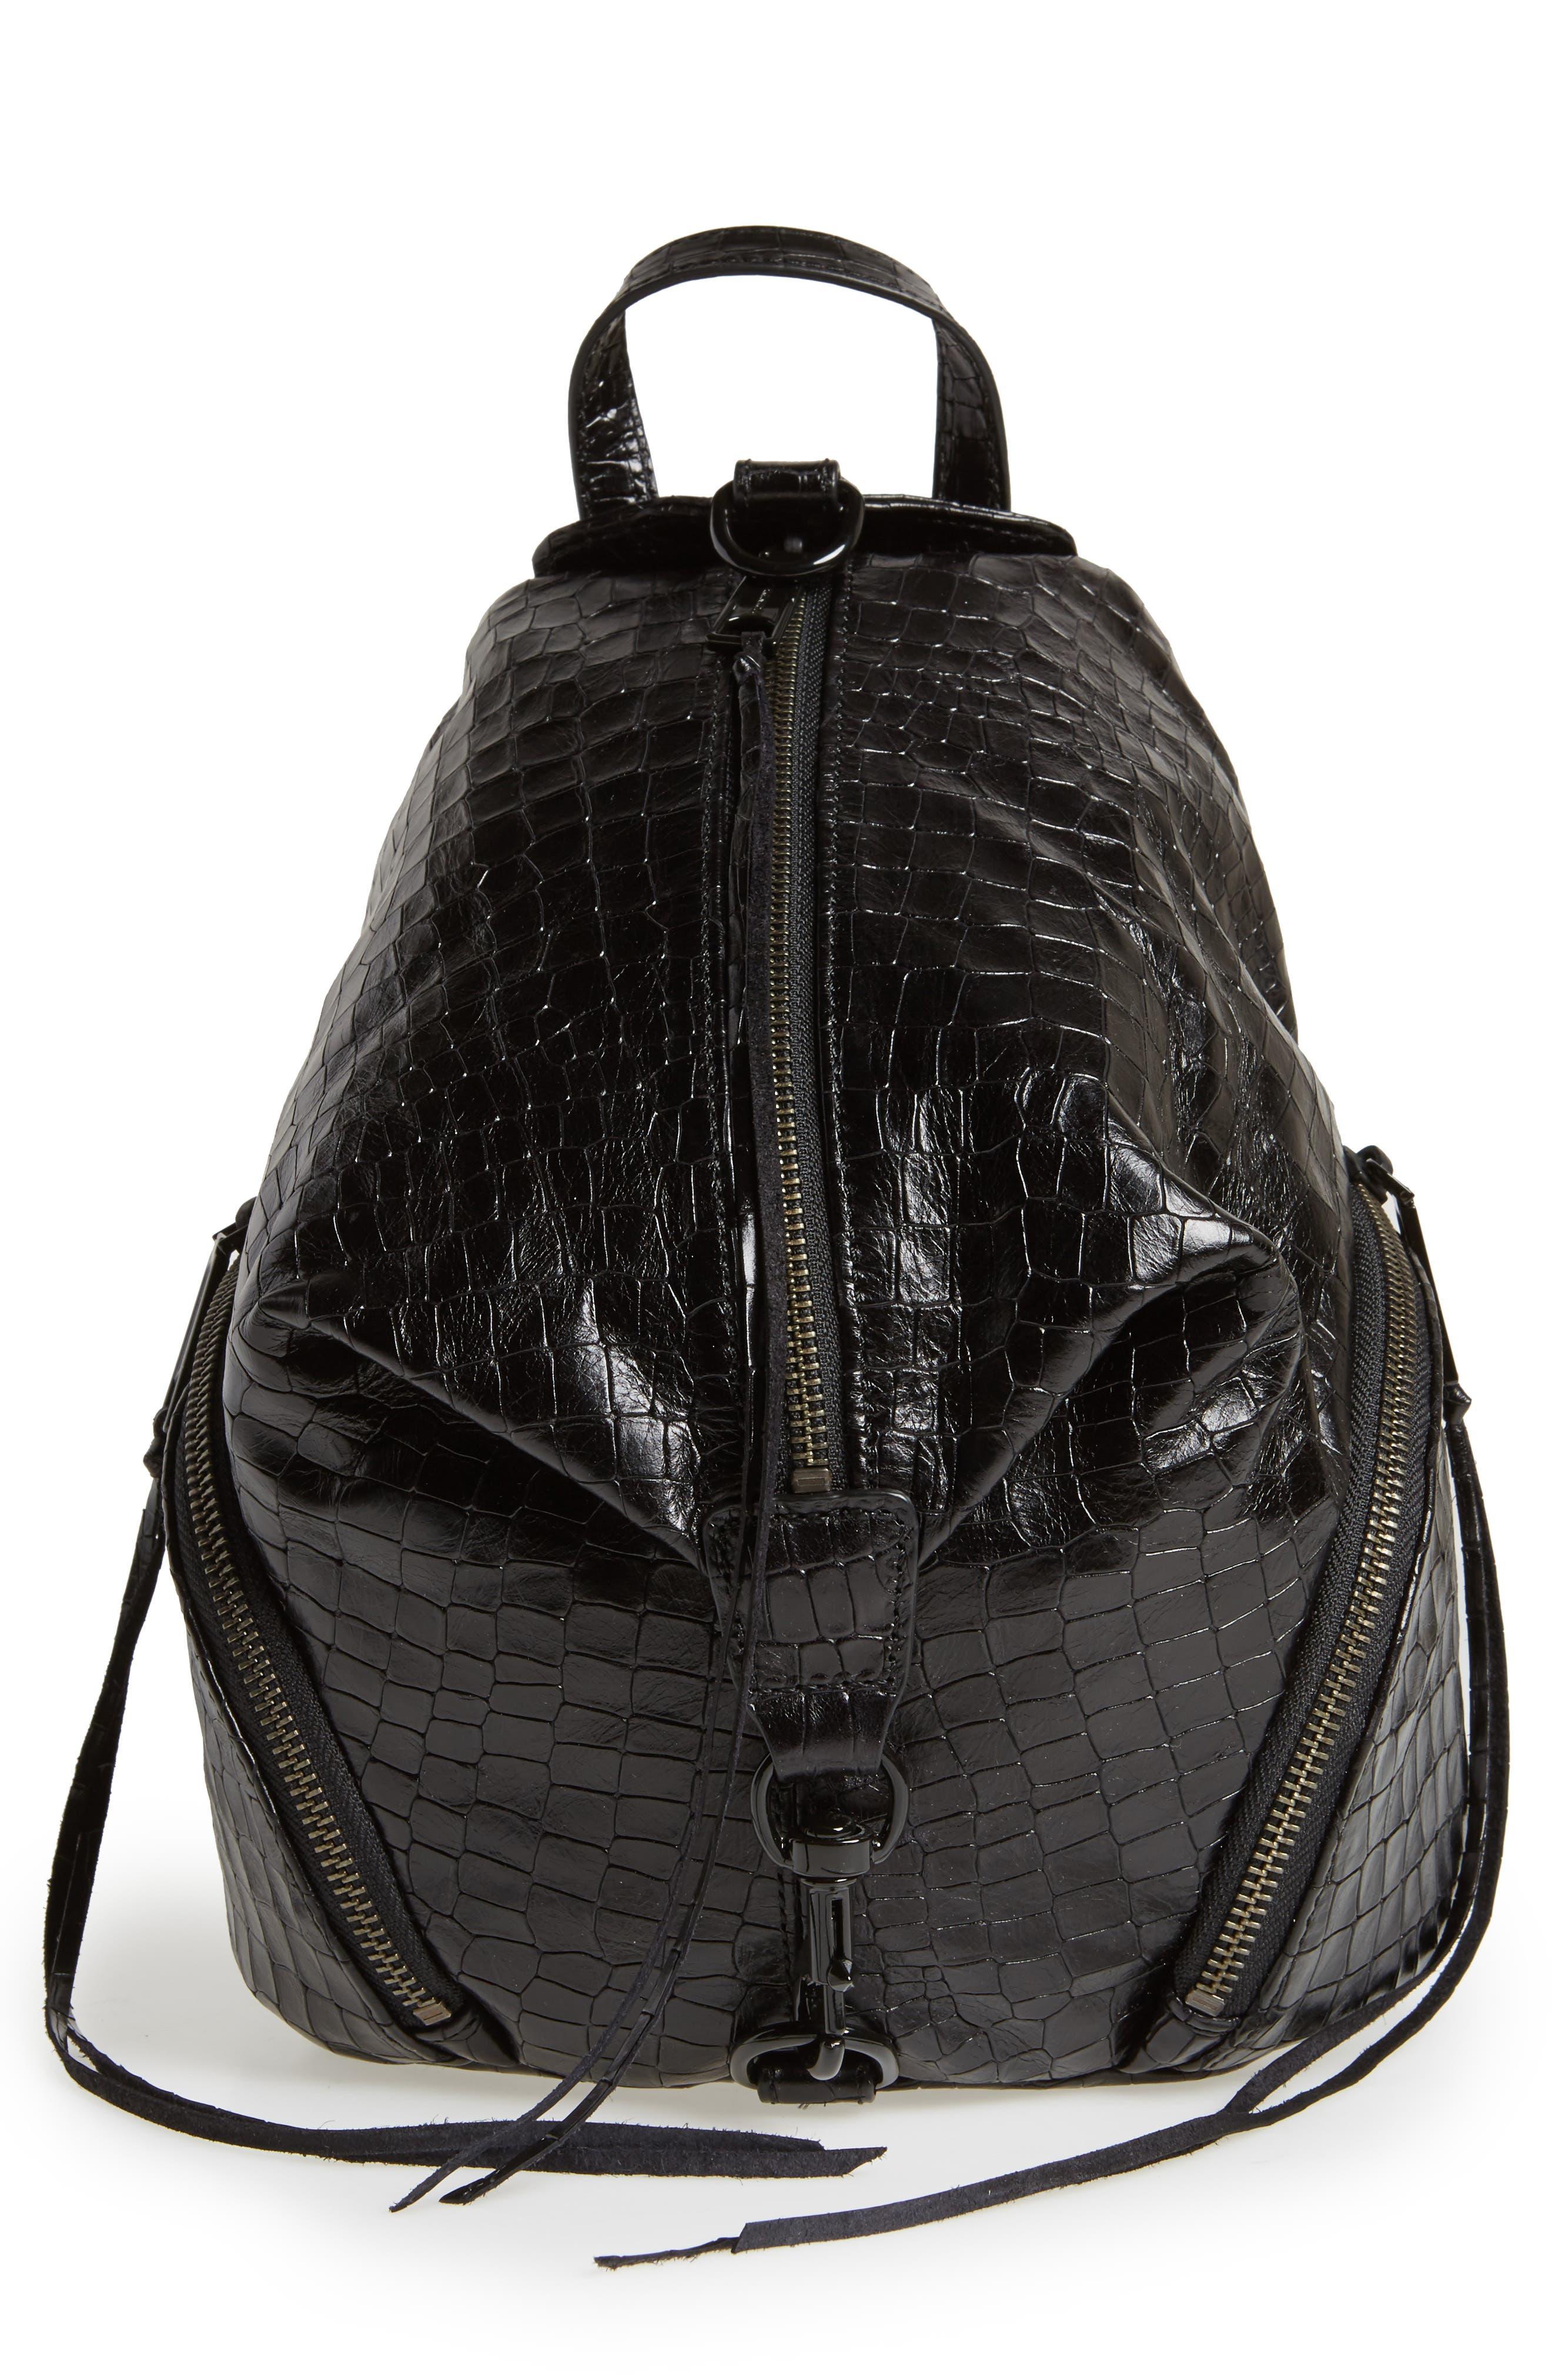 Rebecca Minkoff Medium Julian Croc Embossed Backpack